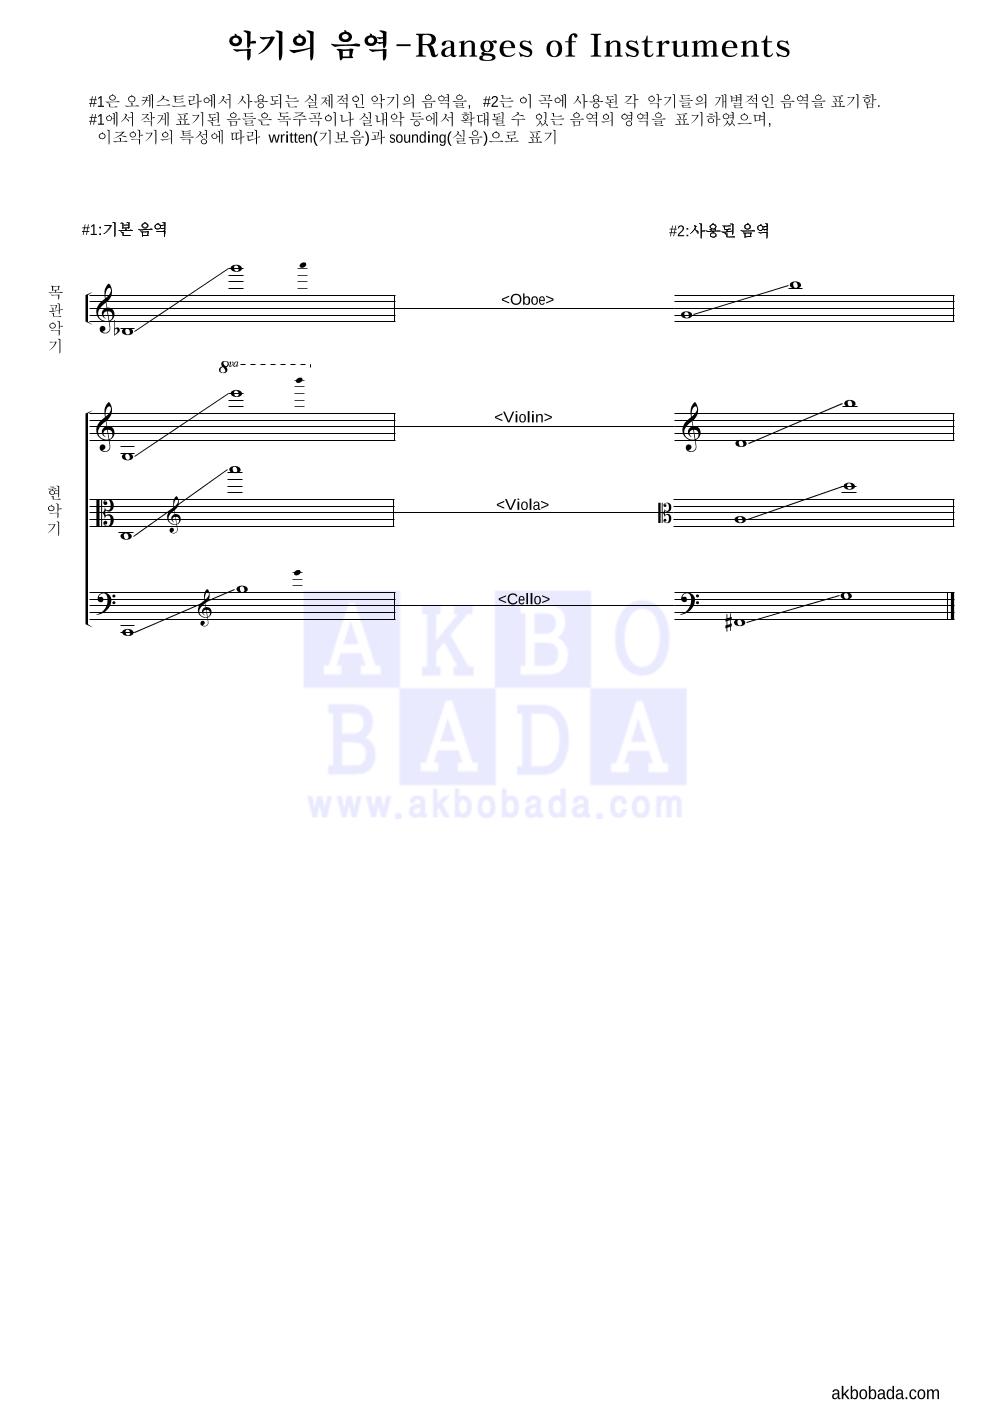 Ennio Morricone - Gabriel's Oboe 편성Ⅰ 악보